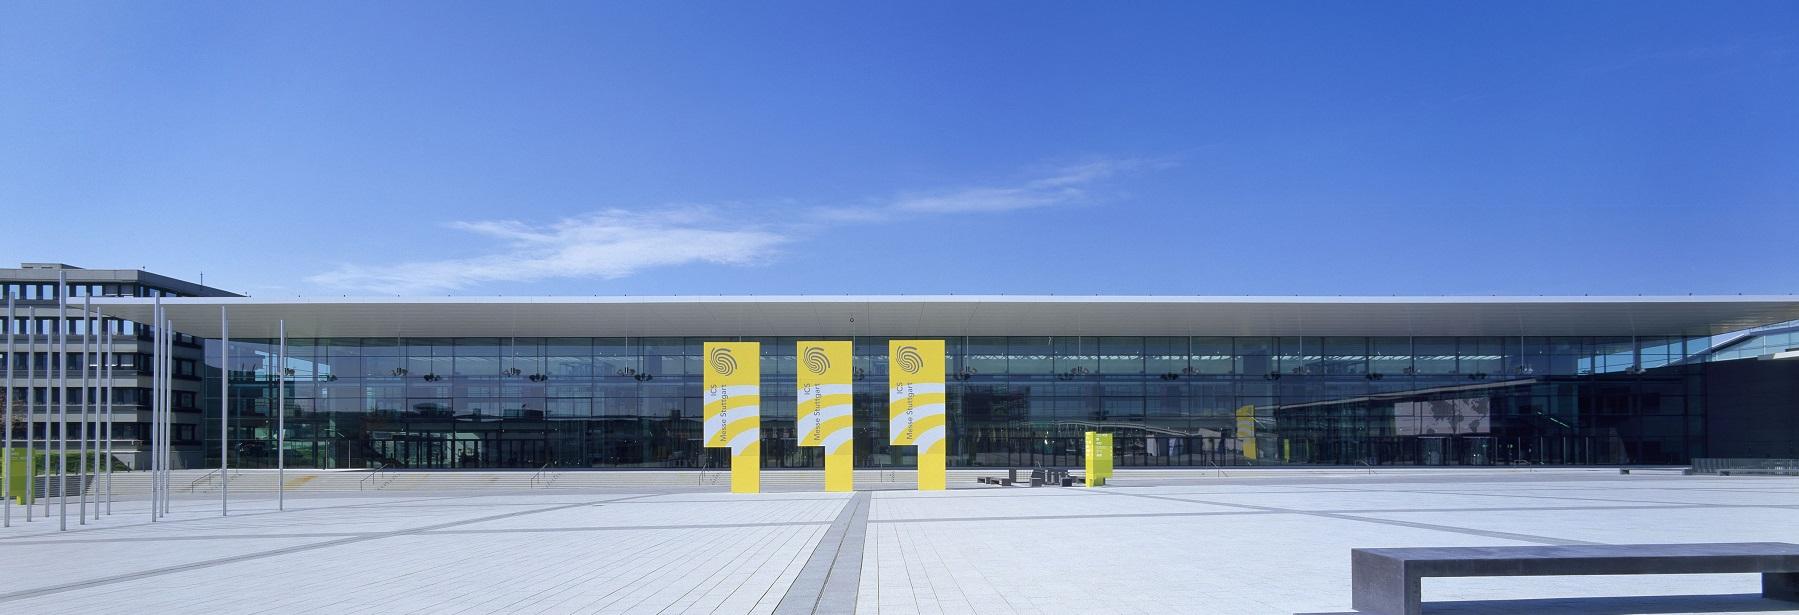 ICS Messe Stuttgart. Foto: Landesmesse Stuttgart